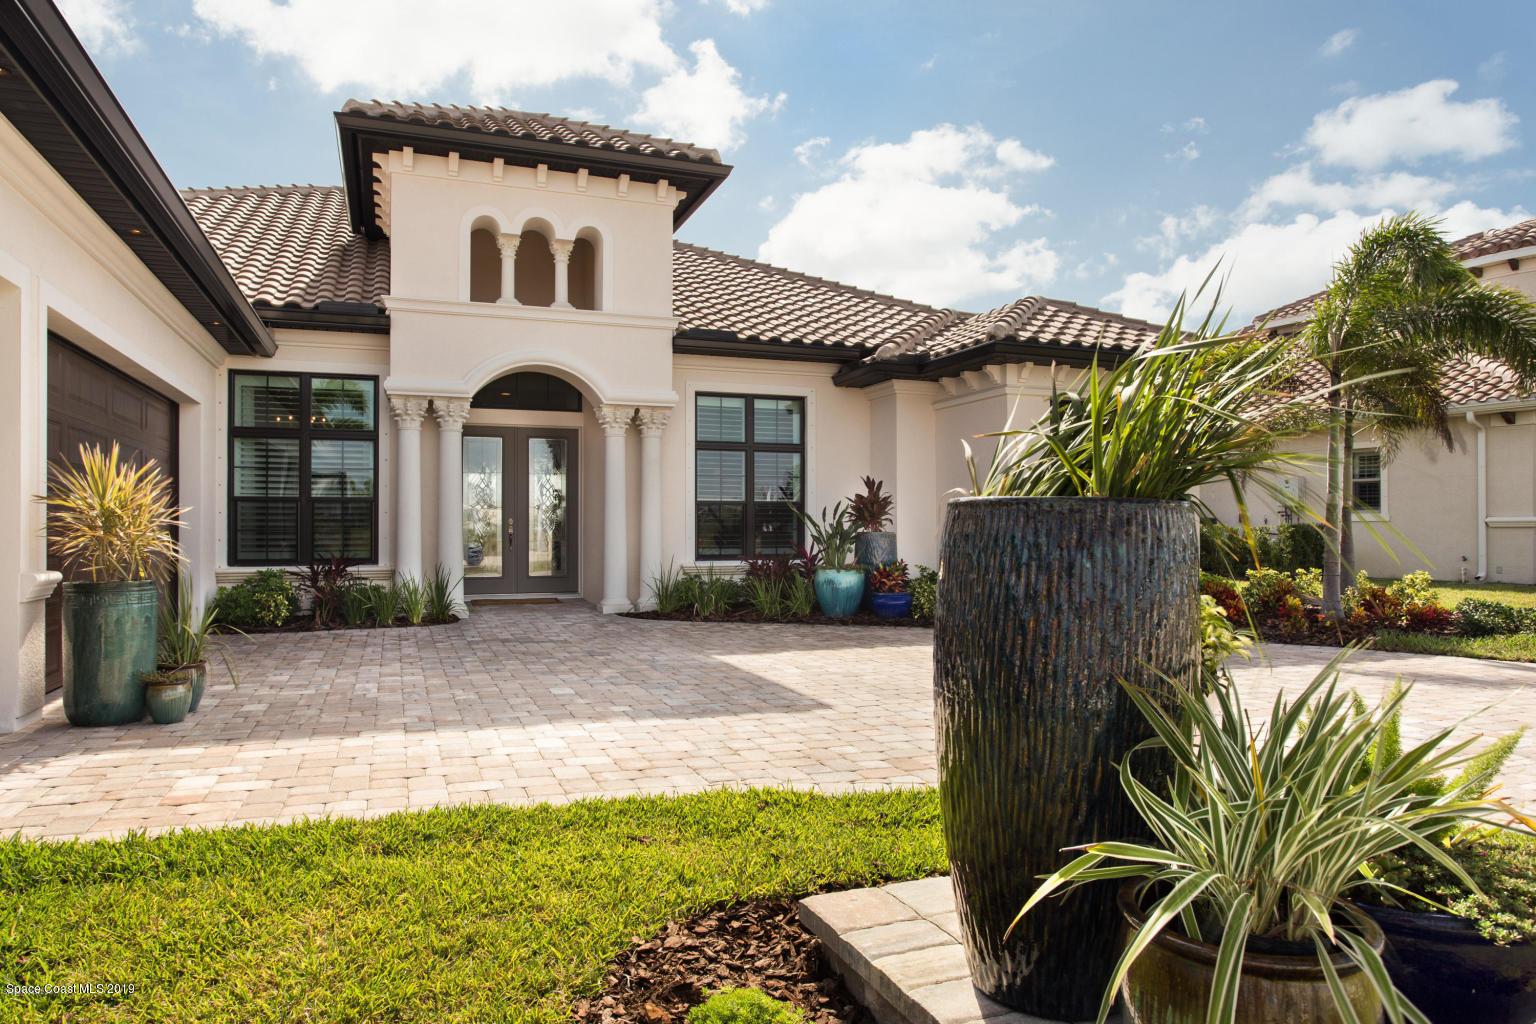 Single Family Home for Sale at 2550 Pimlico Melbourne, Florida 32934 United States